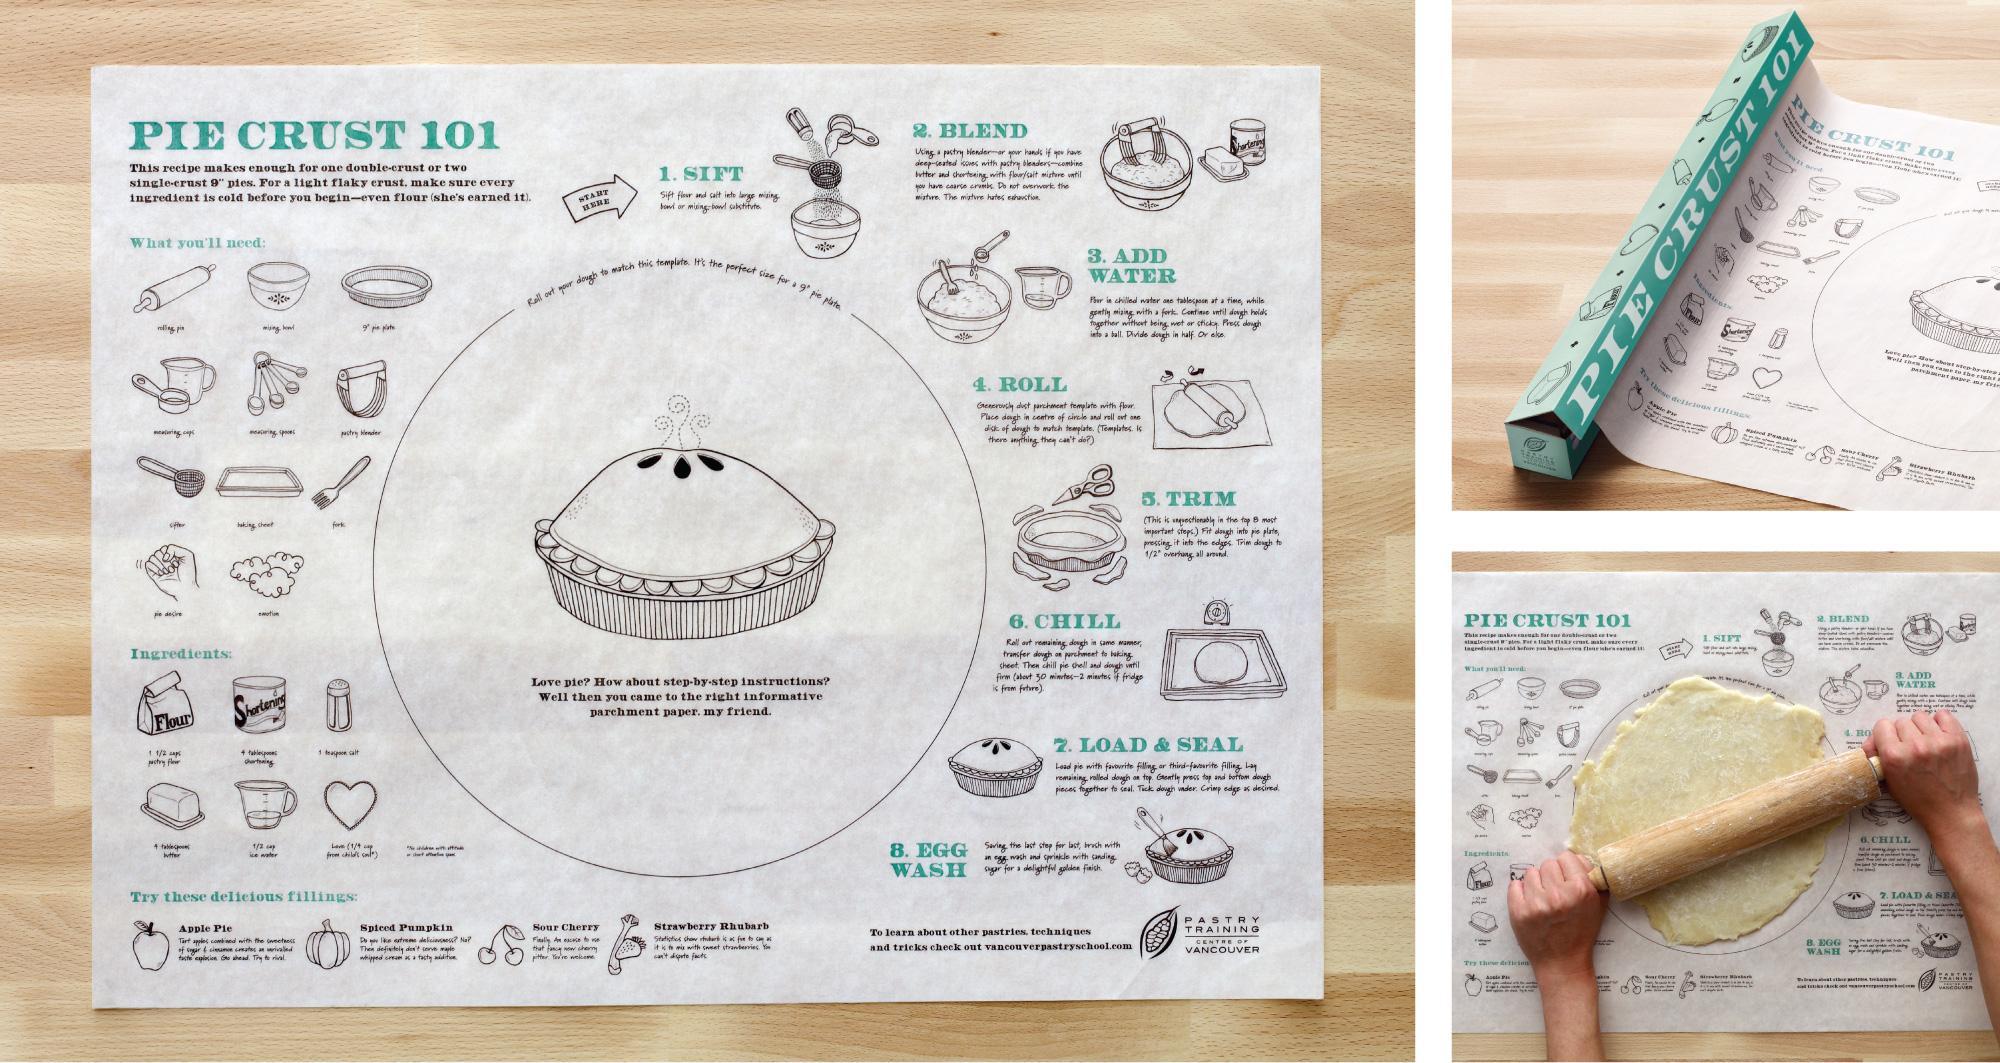 Pastry Training Centre Direct Ad -  Pie Crust 101